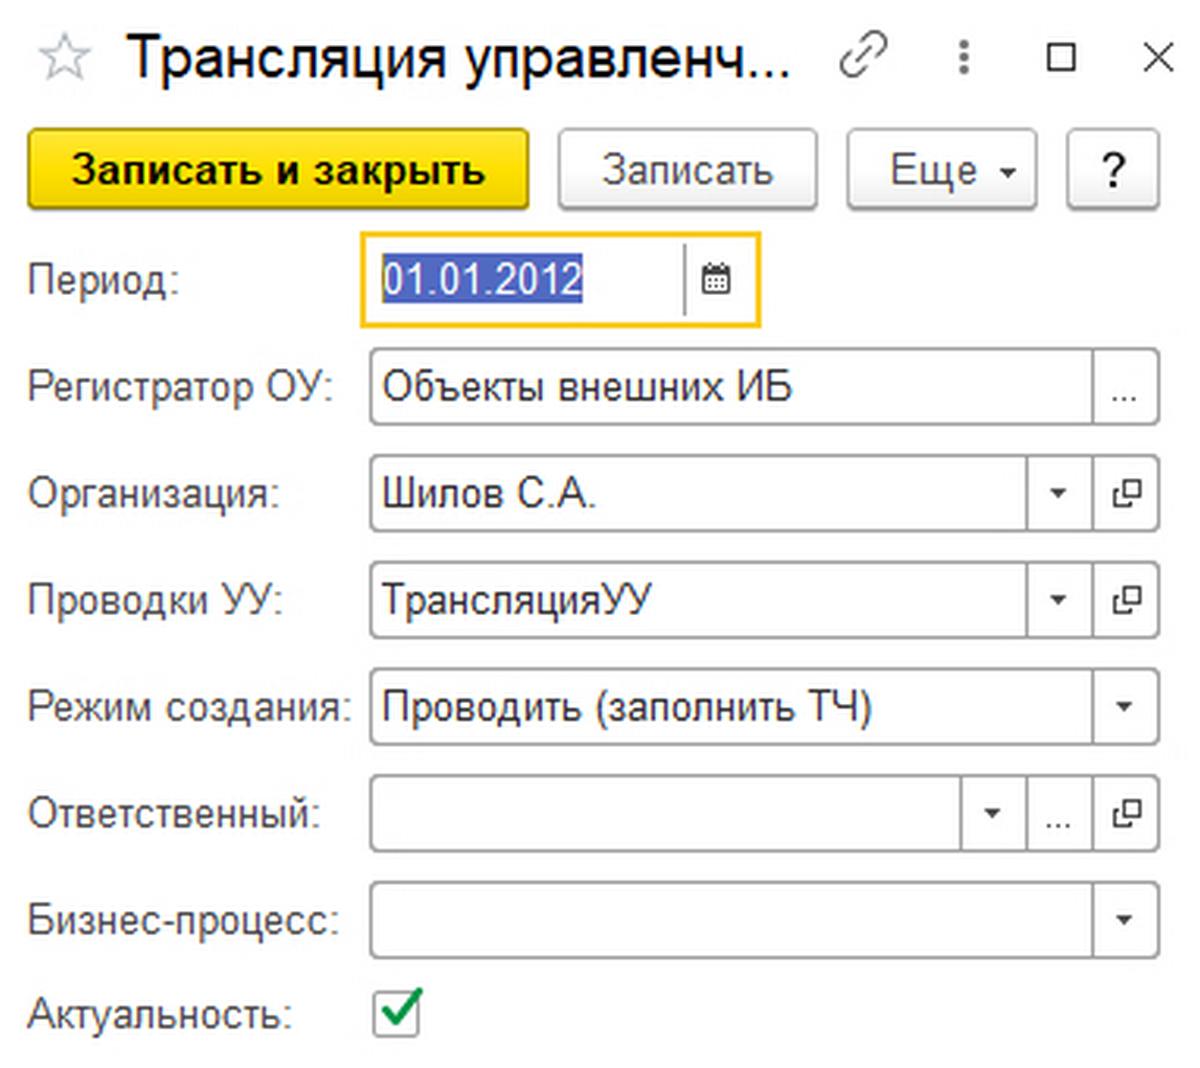 Рис.15 Форма элемента регистра сведений